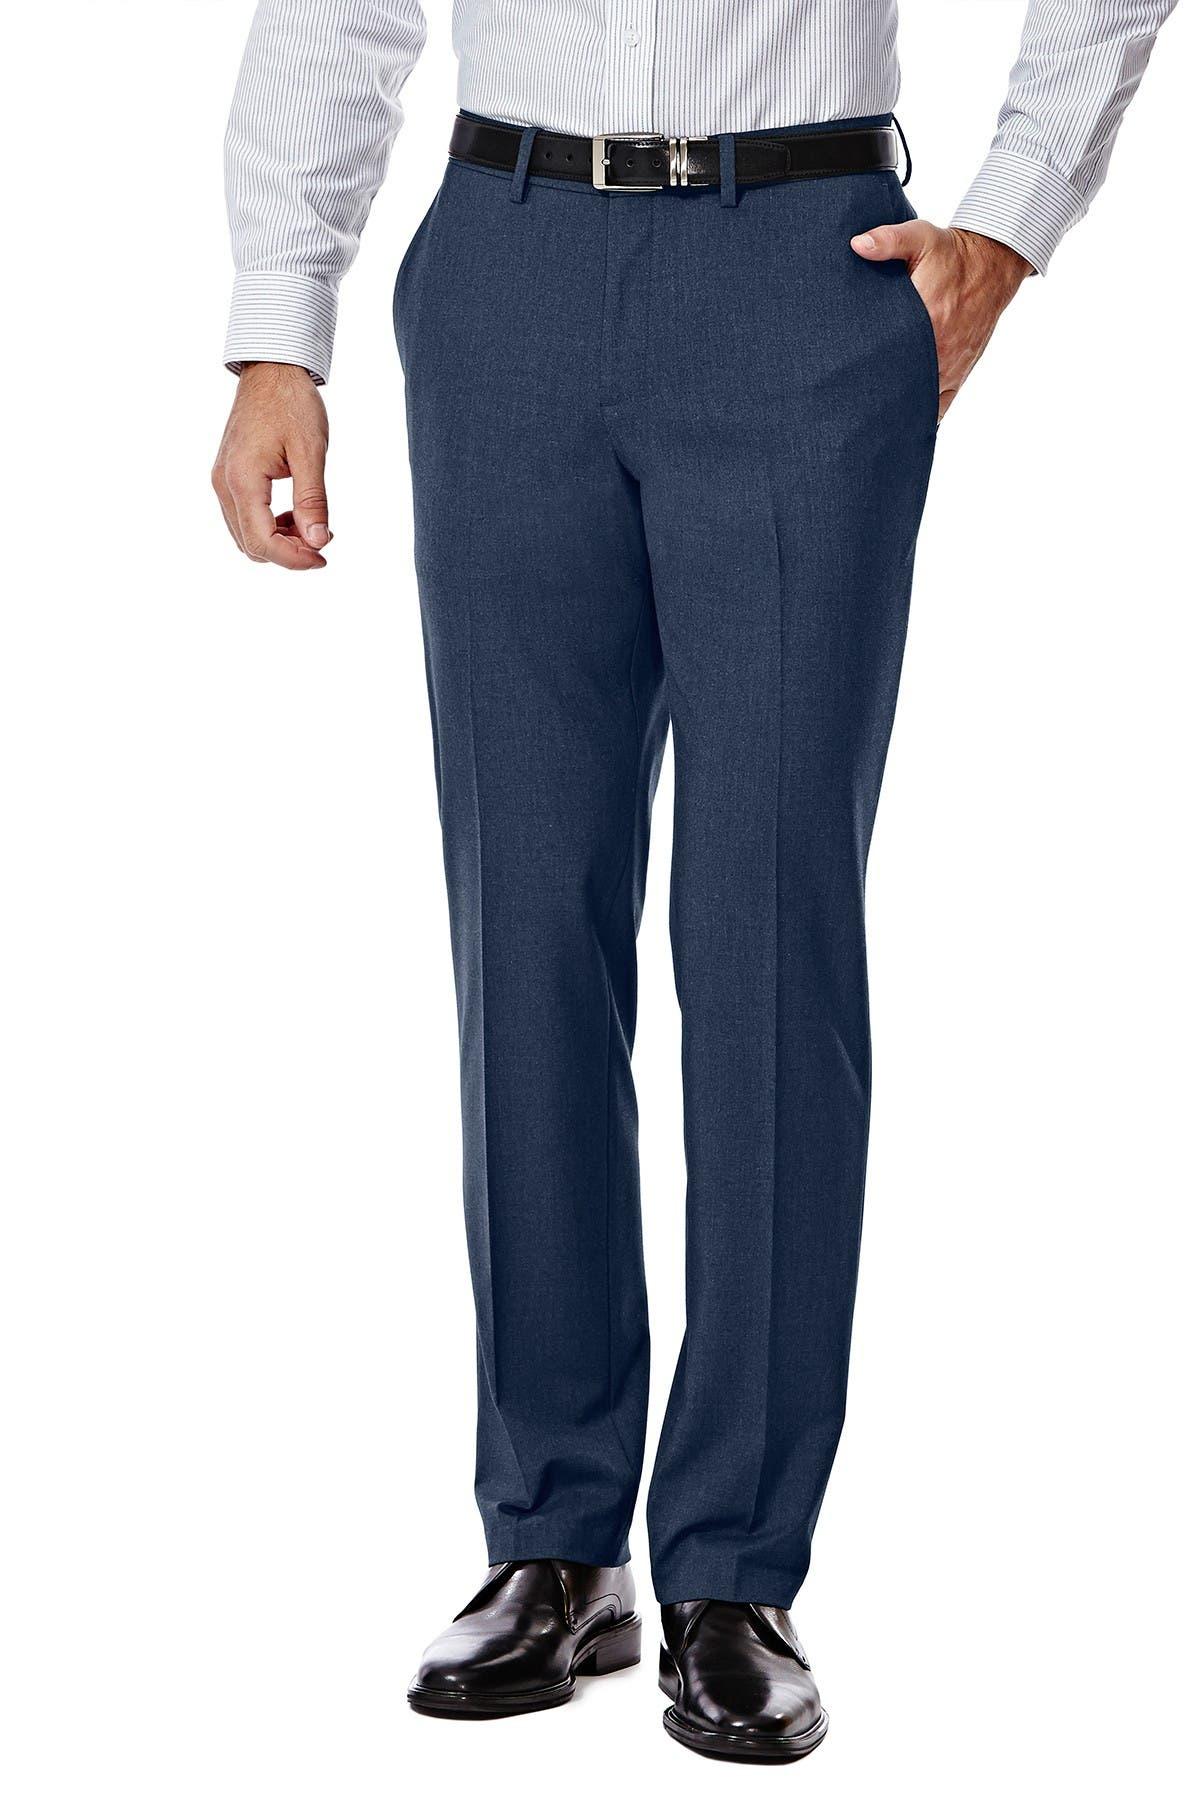 "Image of HAGGAR Gabardine 4-Way Stretch Slim Fit Suit Separate Pants - 30-34"" Inseam"